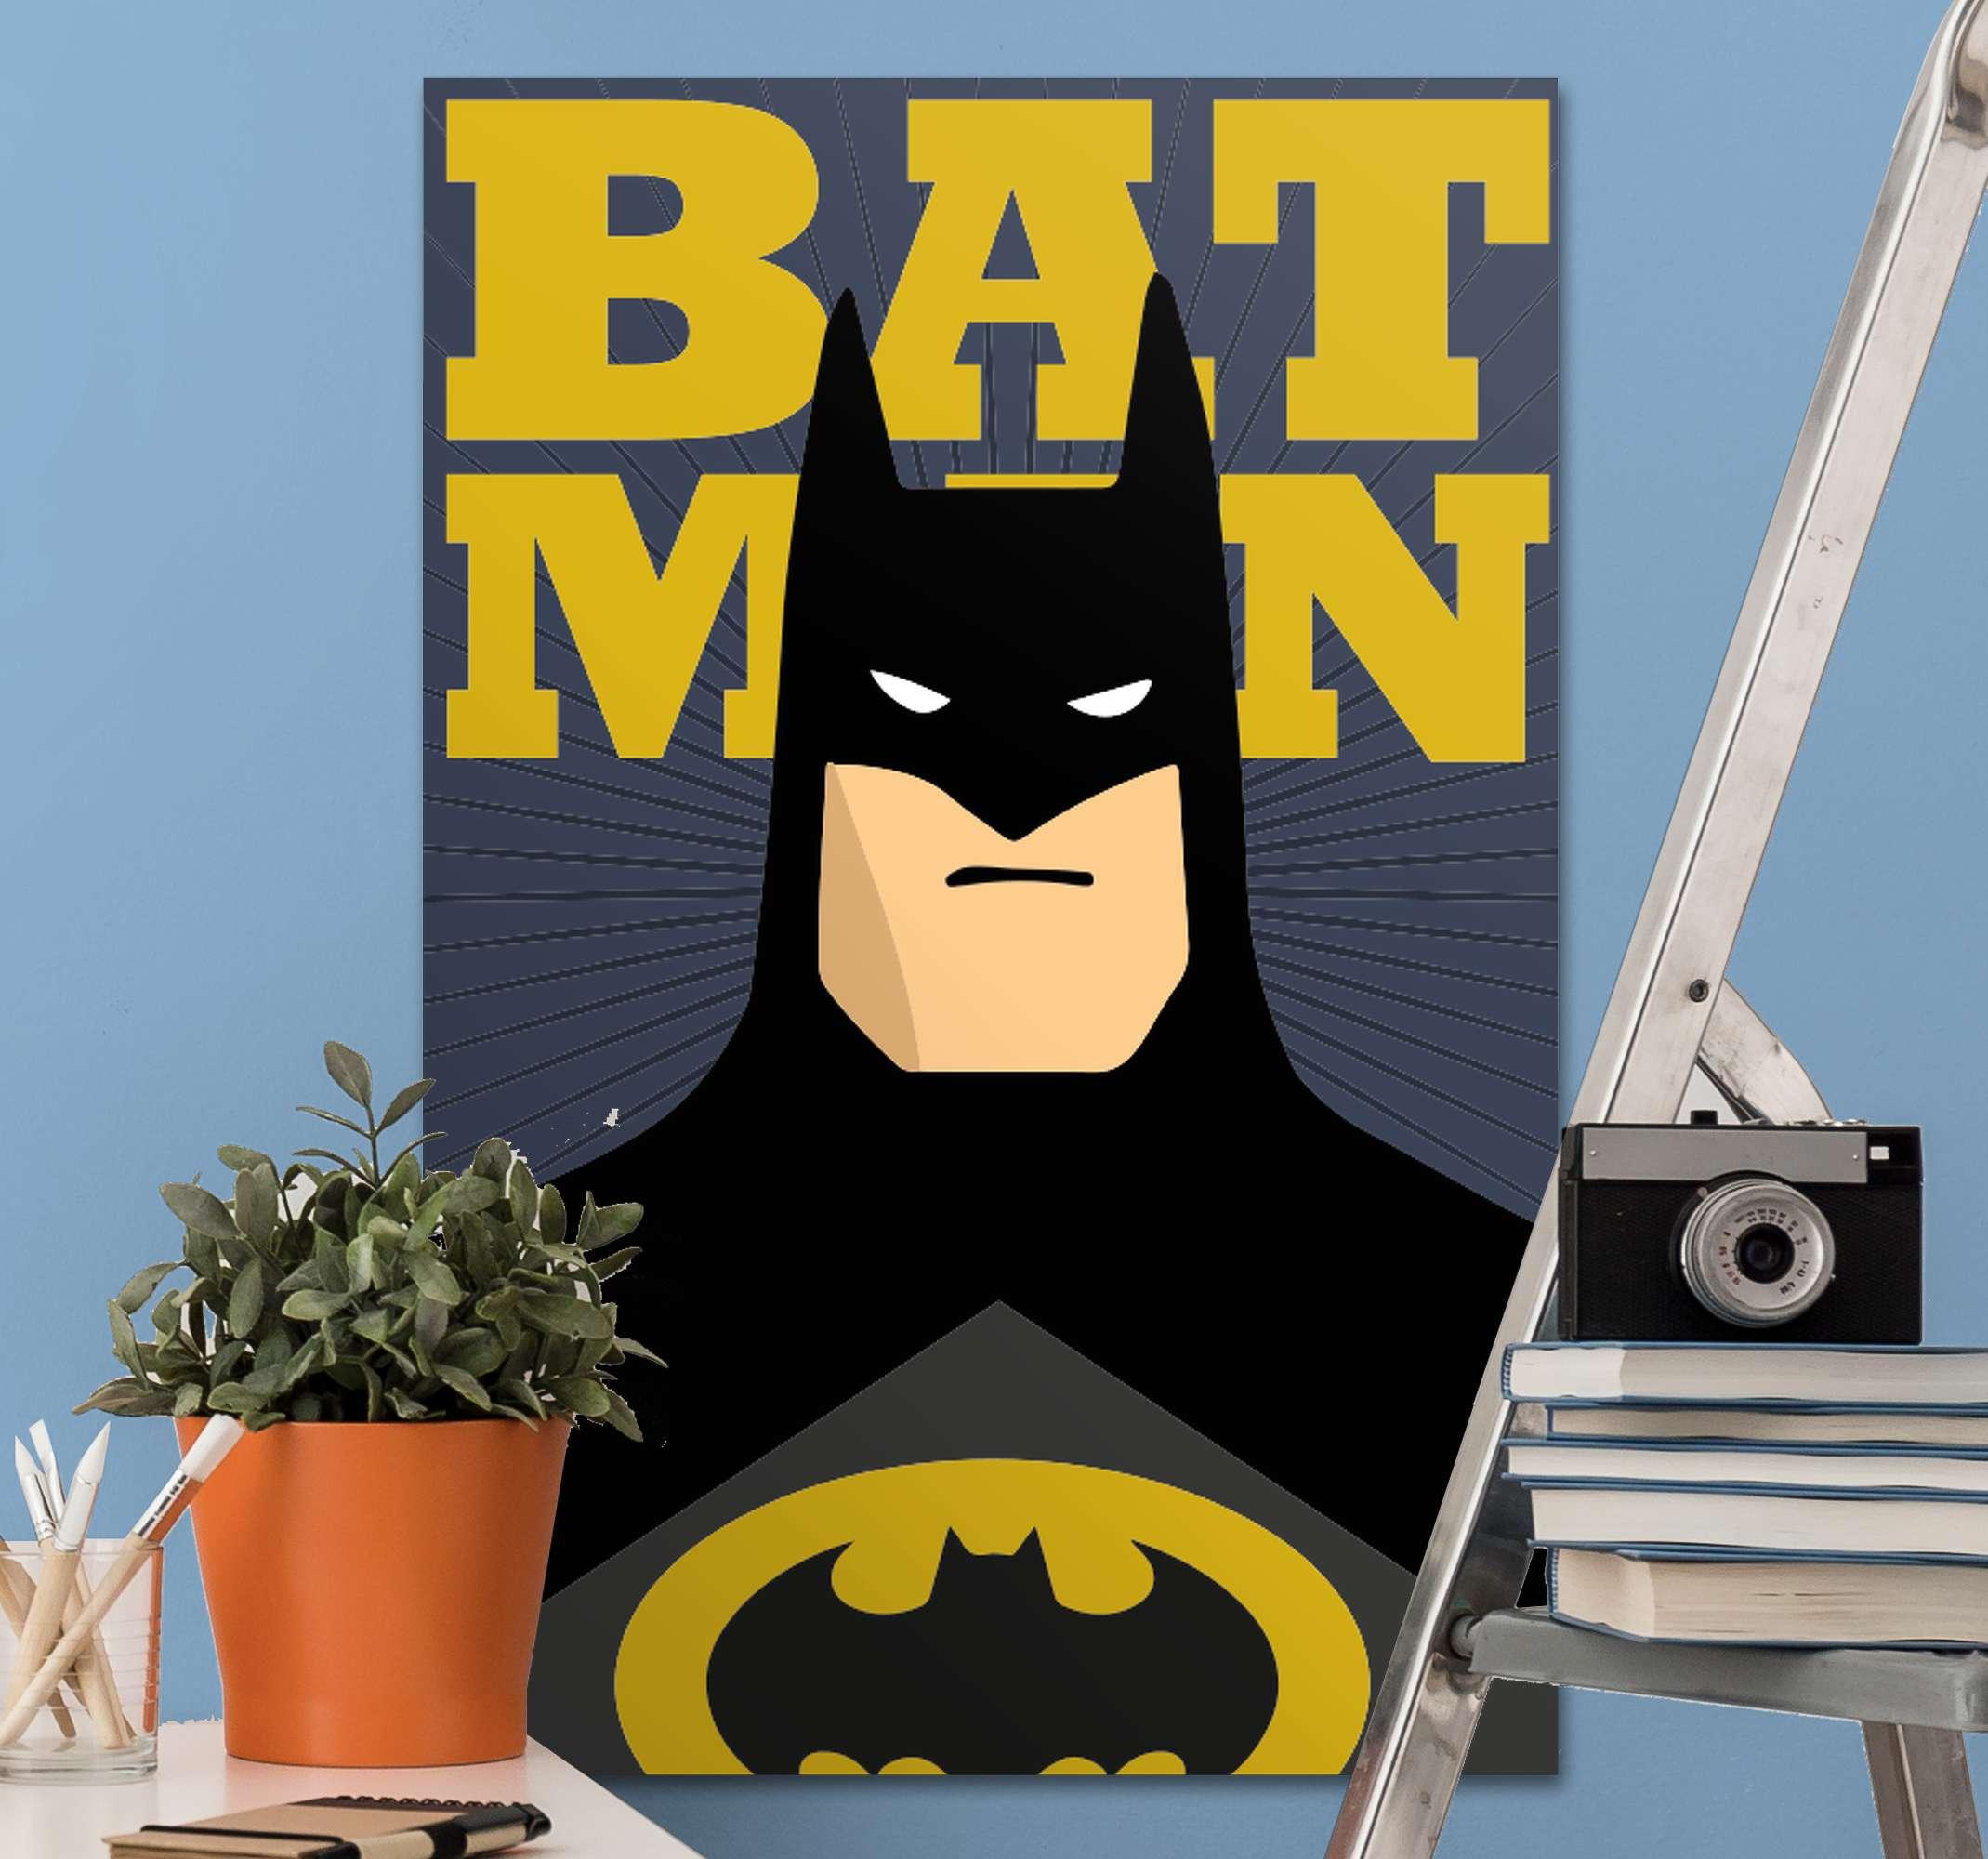 "TenStickers. 超级英雄蝙蝠侠超级英雄裱墙艺术. 蝙蝠侠的帆布打印。它显示了穿着黑色衣服的蝙蝠侠的胸像和文字""蝙蝠侠""。由优质材料制成。看看这个!"